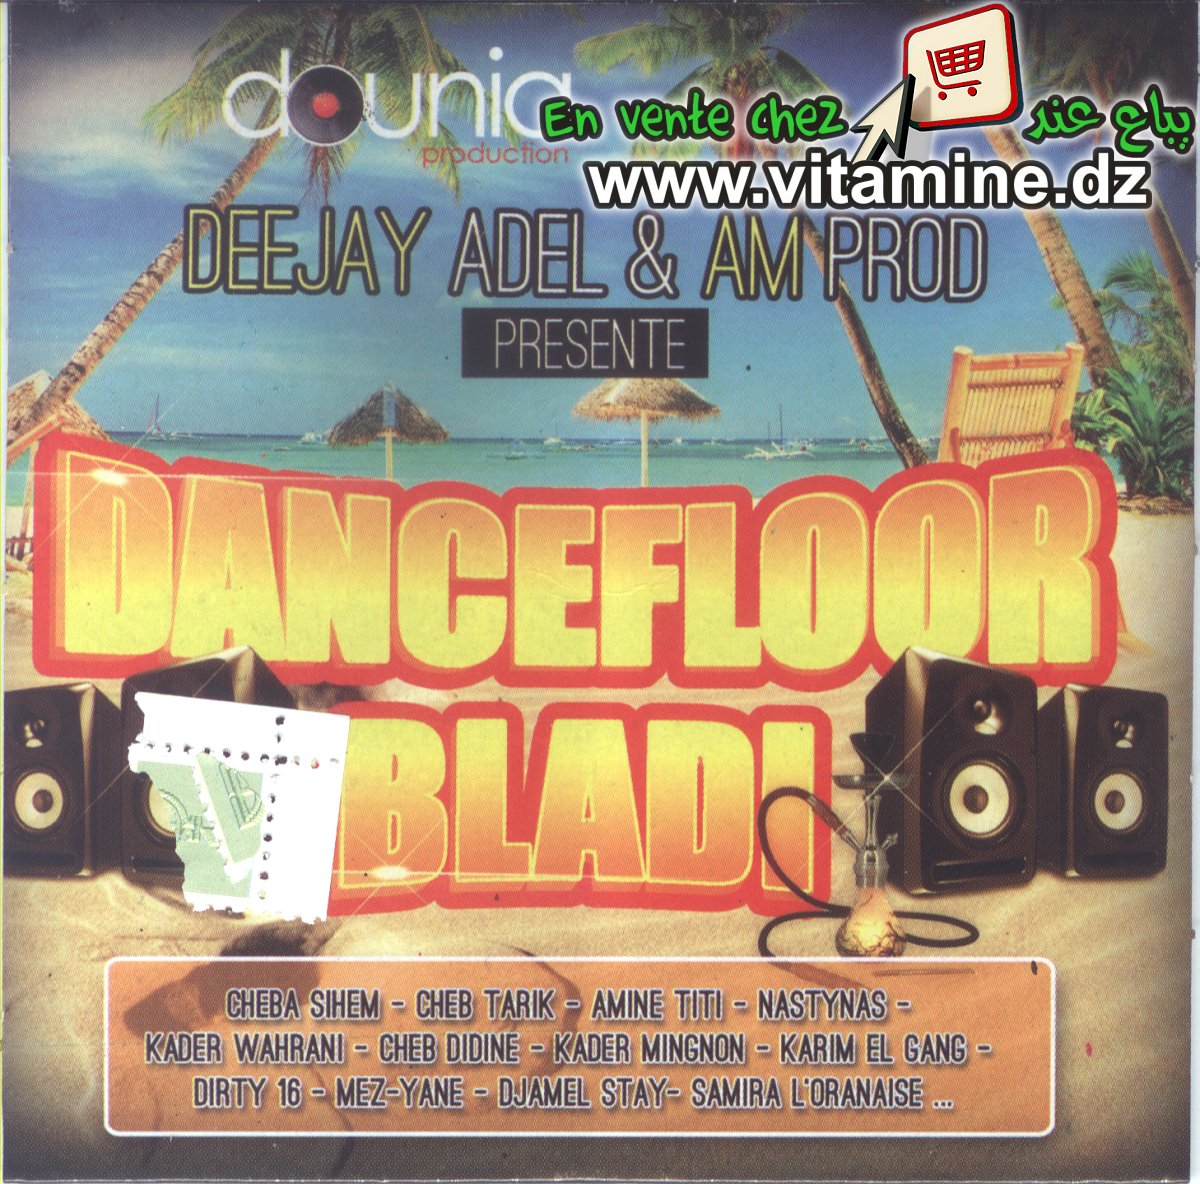 Deejay Adel & Am Prod - Dancefloor Bladi